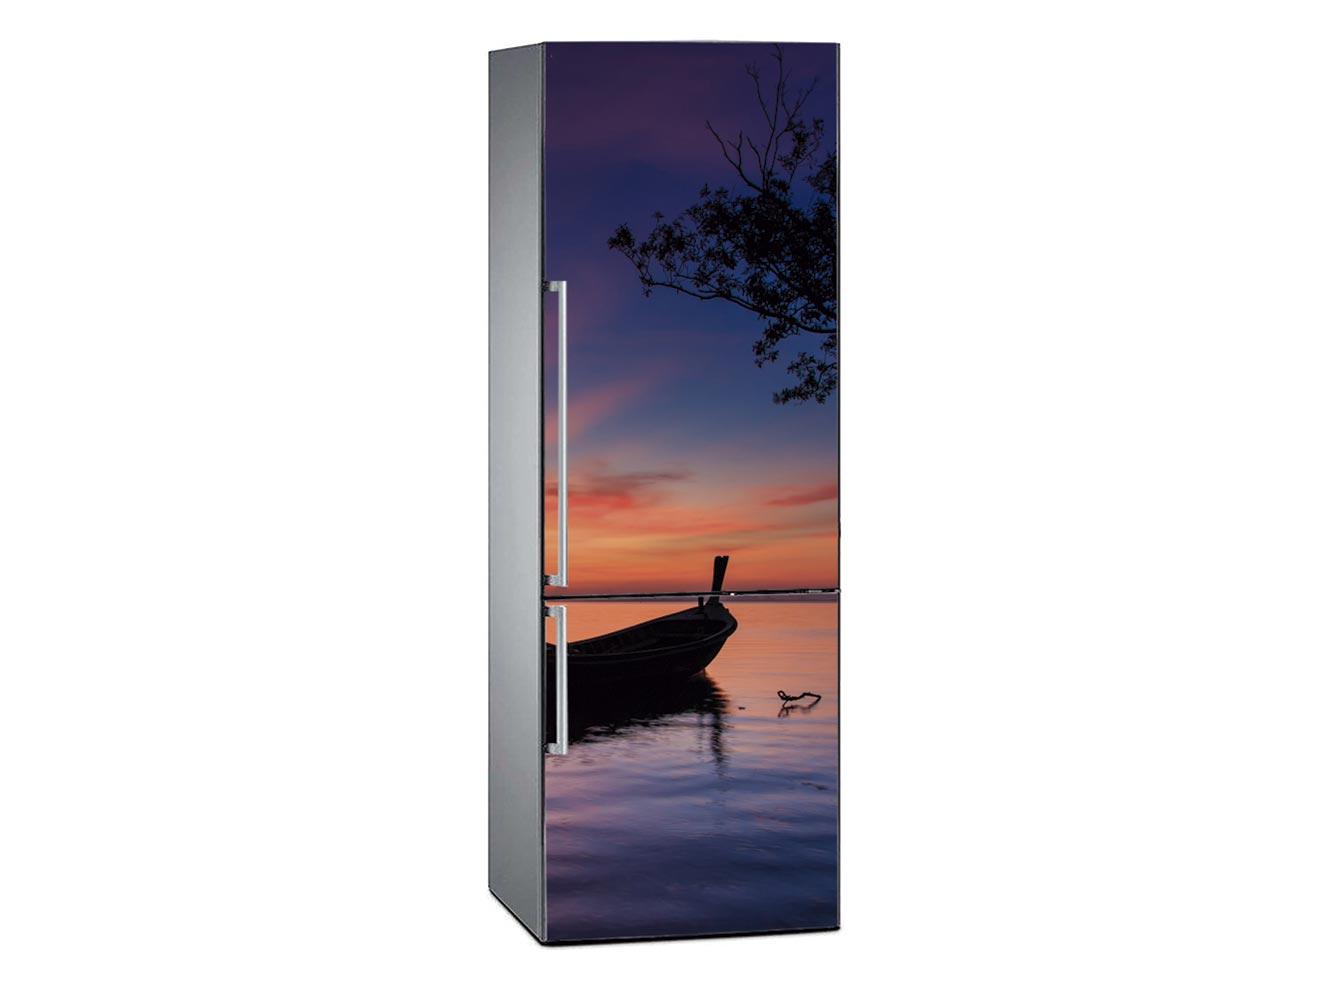 Vinilo Frigorífico Amanecer en Playa de Tailandia | Carteles XXL - Impresión carteleria publicitaria